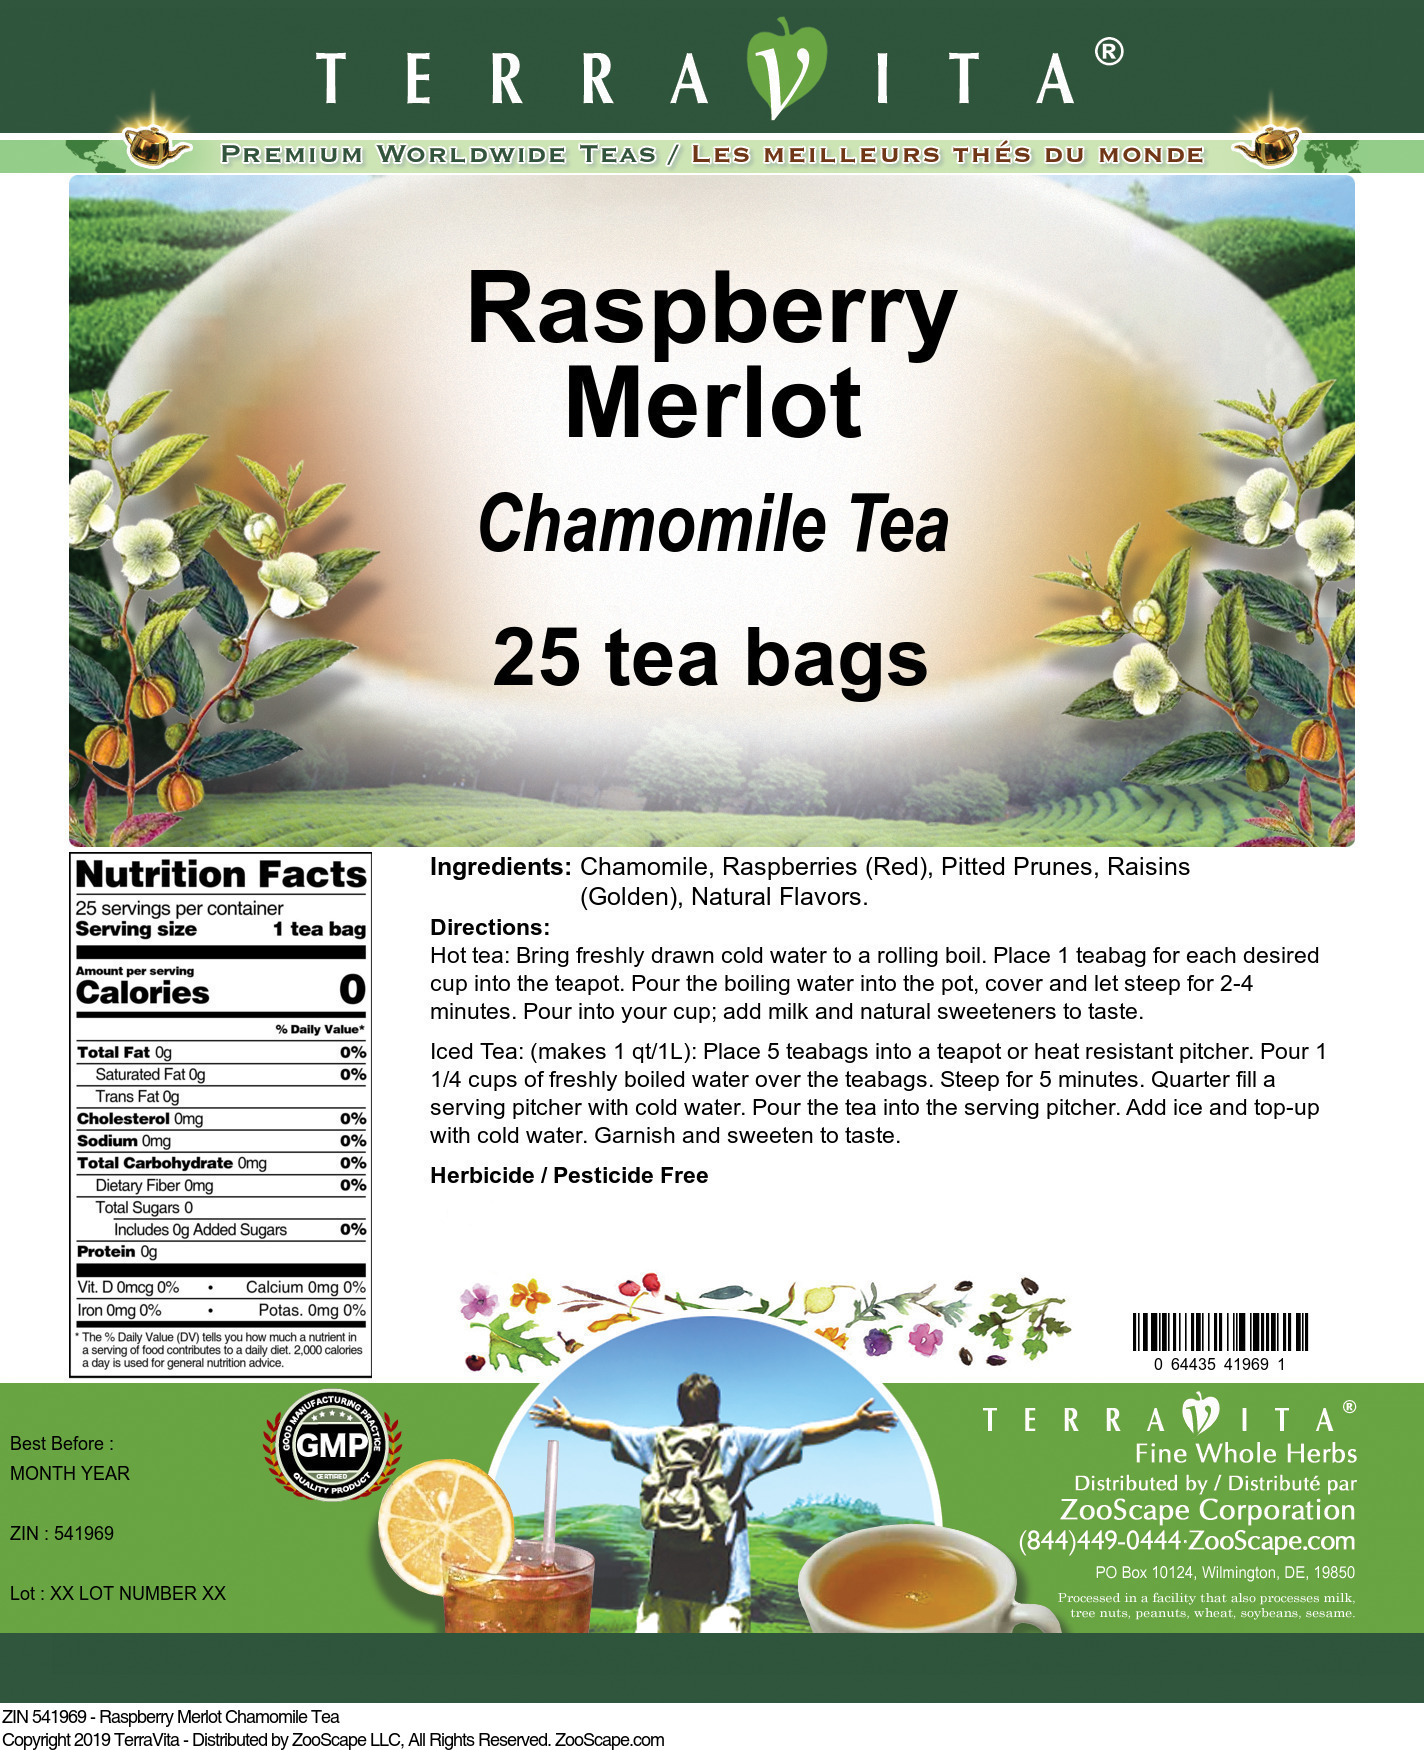 Raspberry Merlot Chamomile Tea